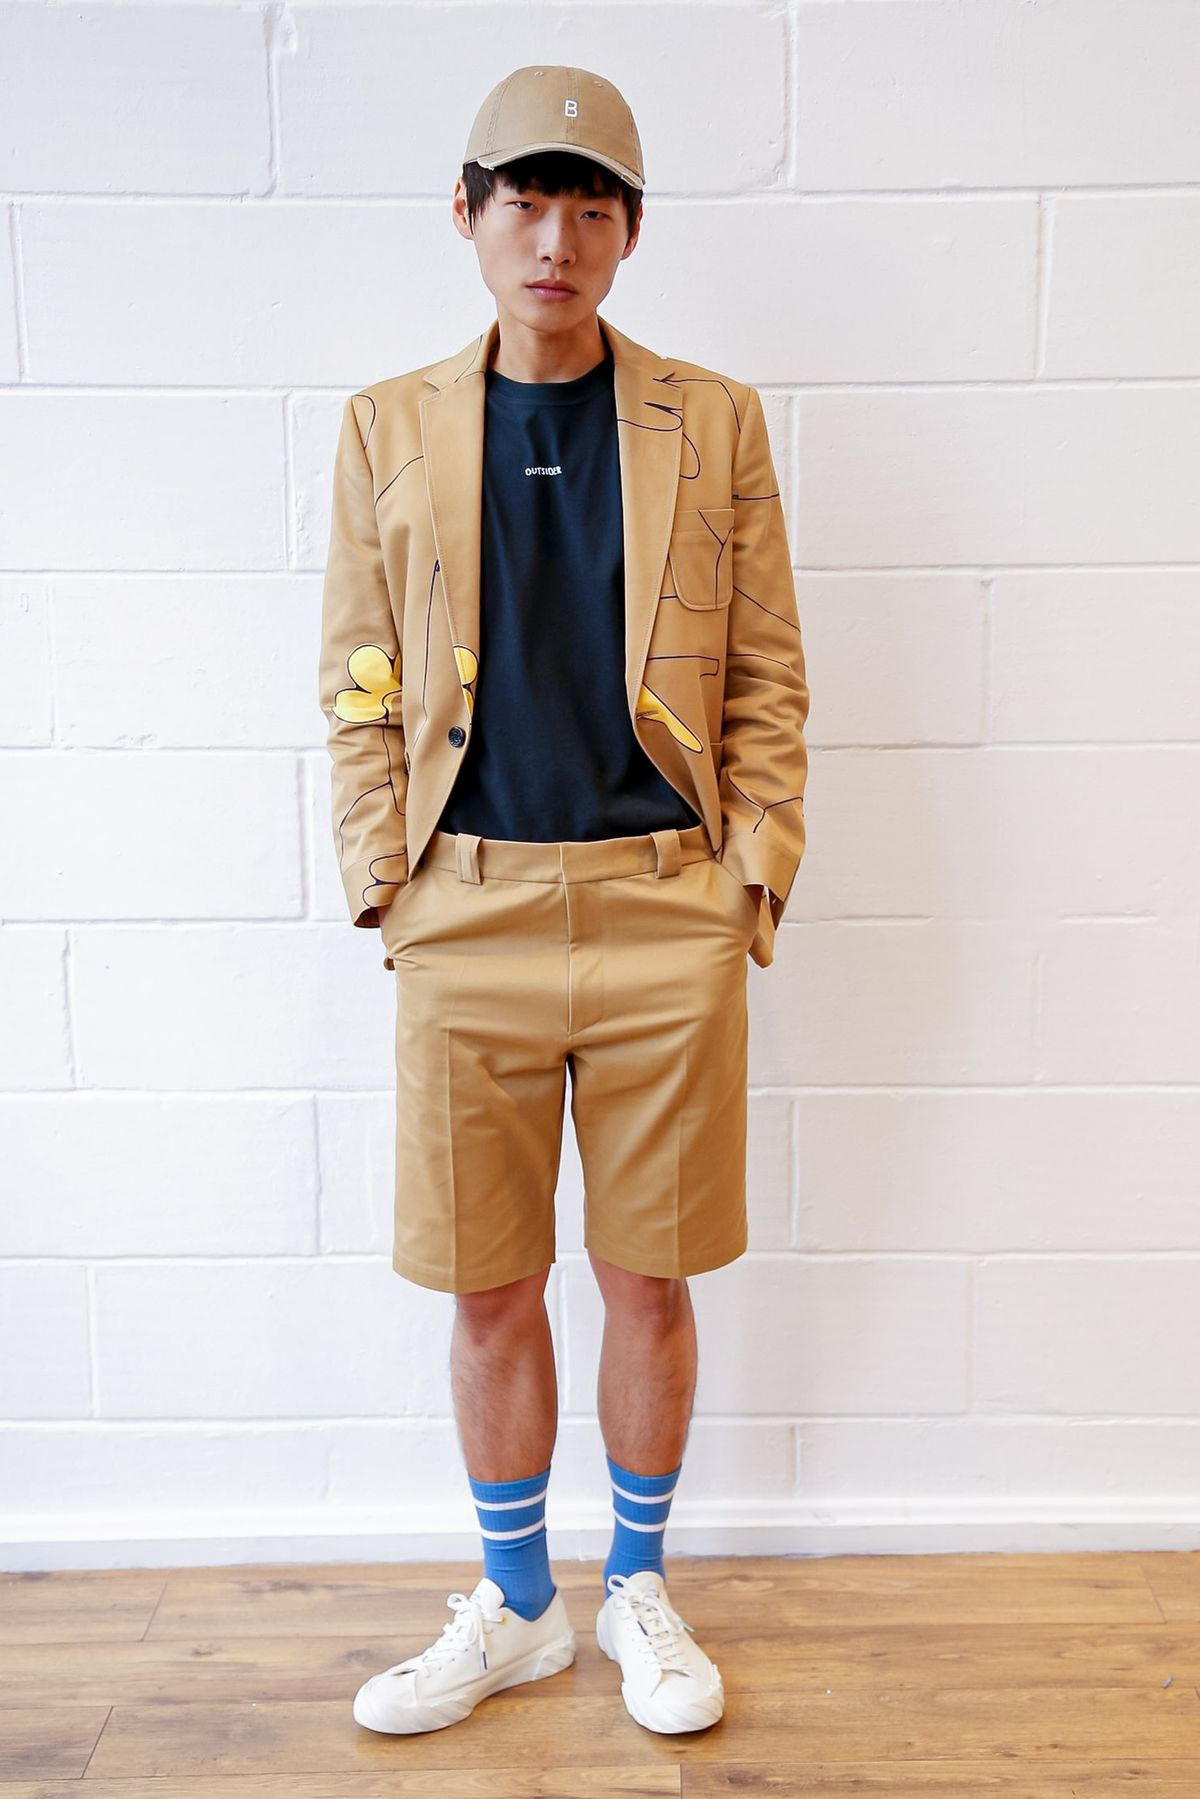 quan short bermuda - elleman - 0421 - elle man style calendar - smart casual - fashionably male